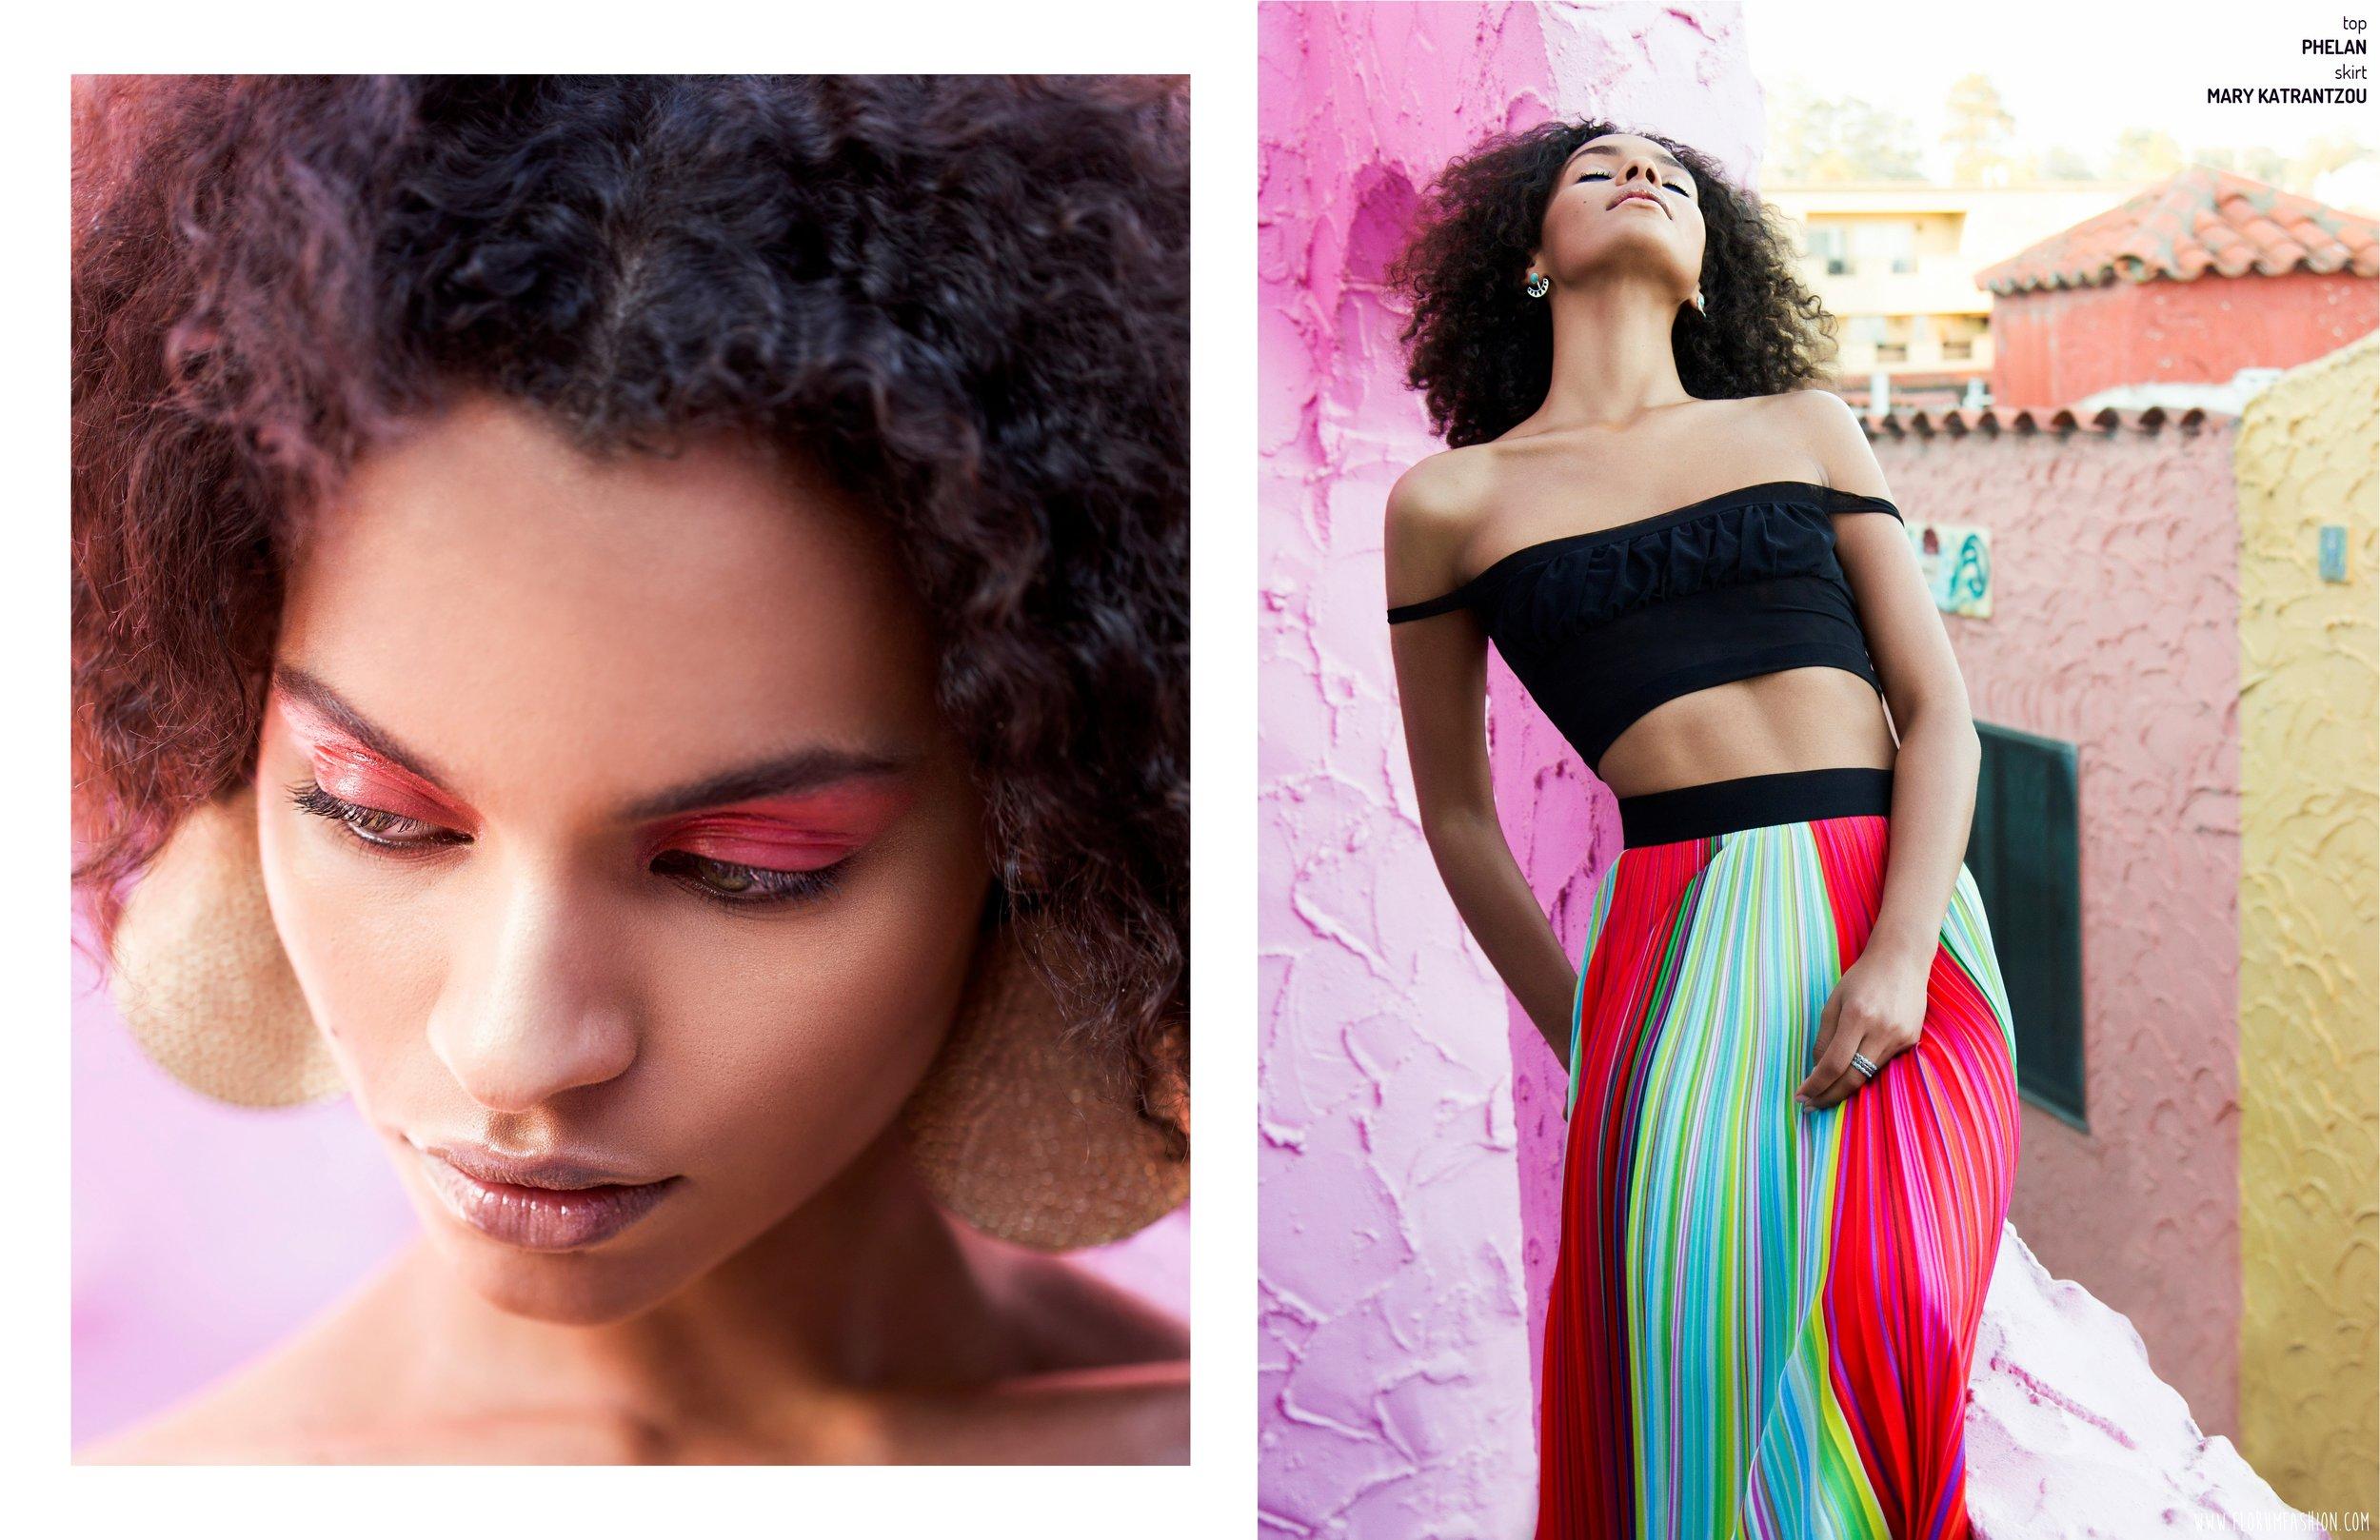 Once Upon A Decade - Havana Cuba Fashion - Bailey Harada Stone - Florum Magazine - Star Burleigh - Sophia Jackson Scout Model Agency - Jill Marie Makeup - San Francisco